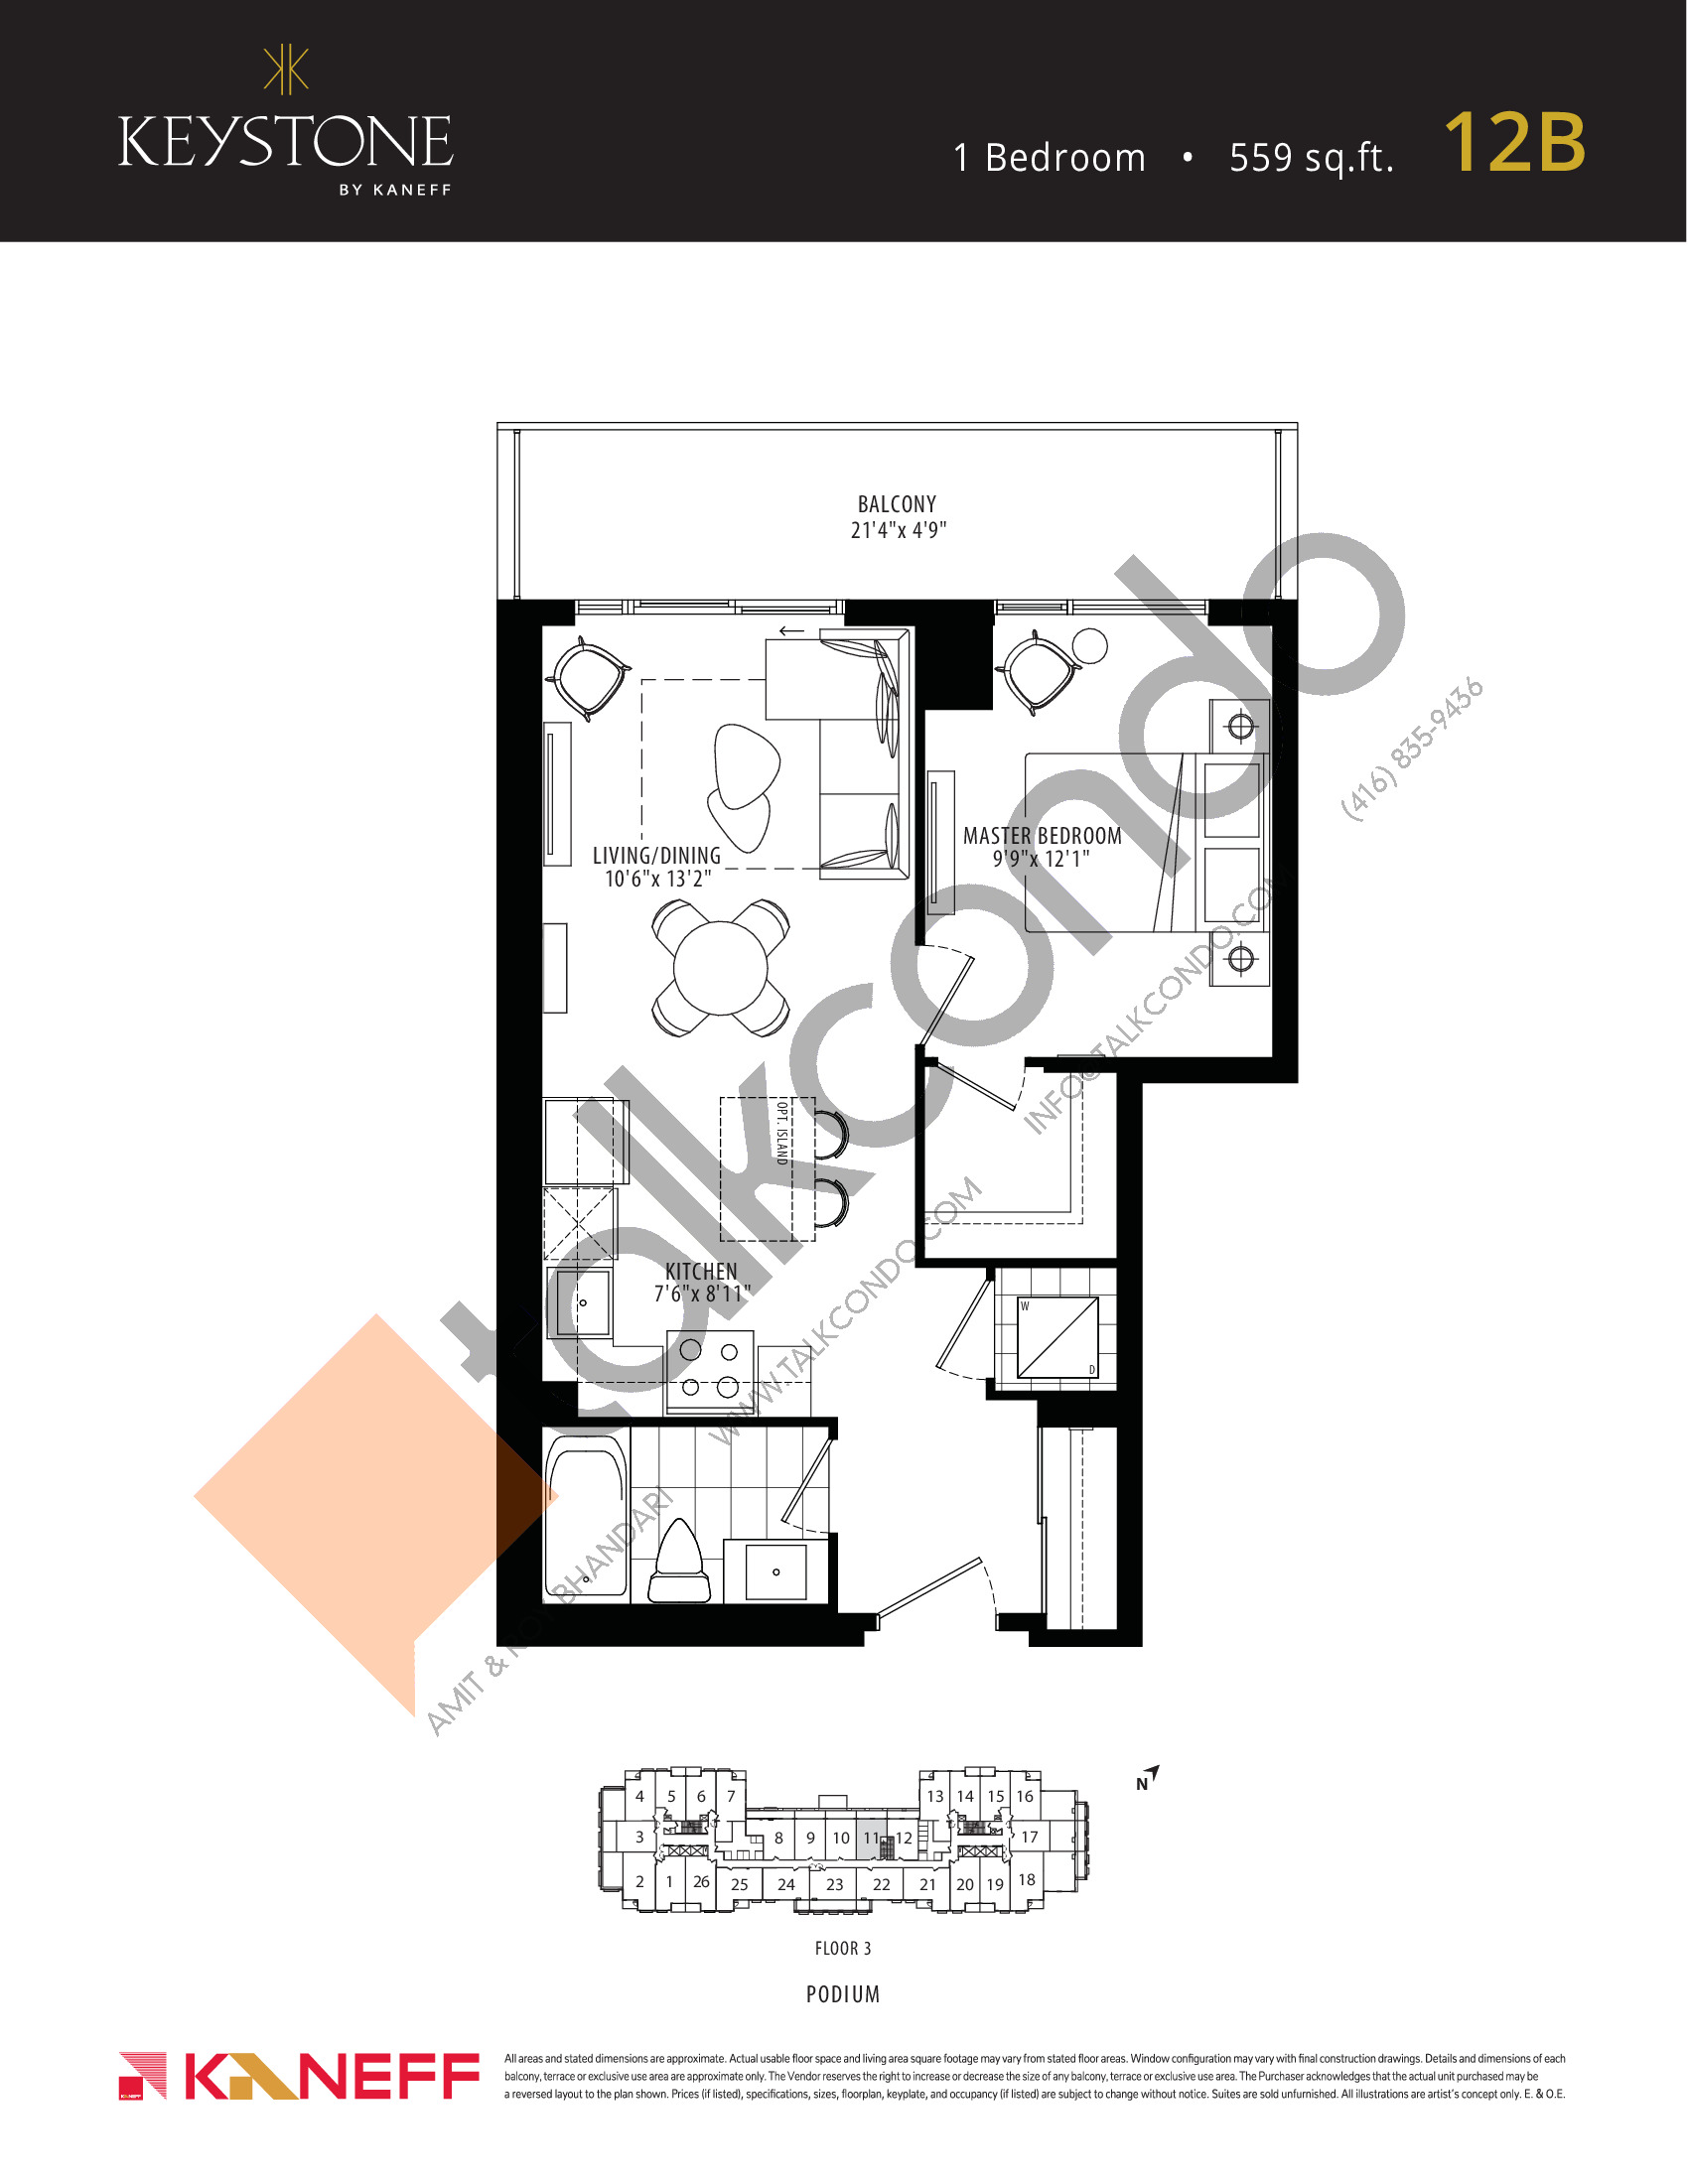 12B Floor Plan at Keystone Condos Phase 2 - 559 sq.ft